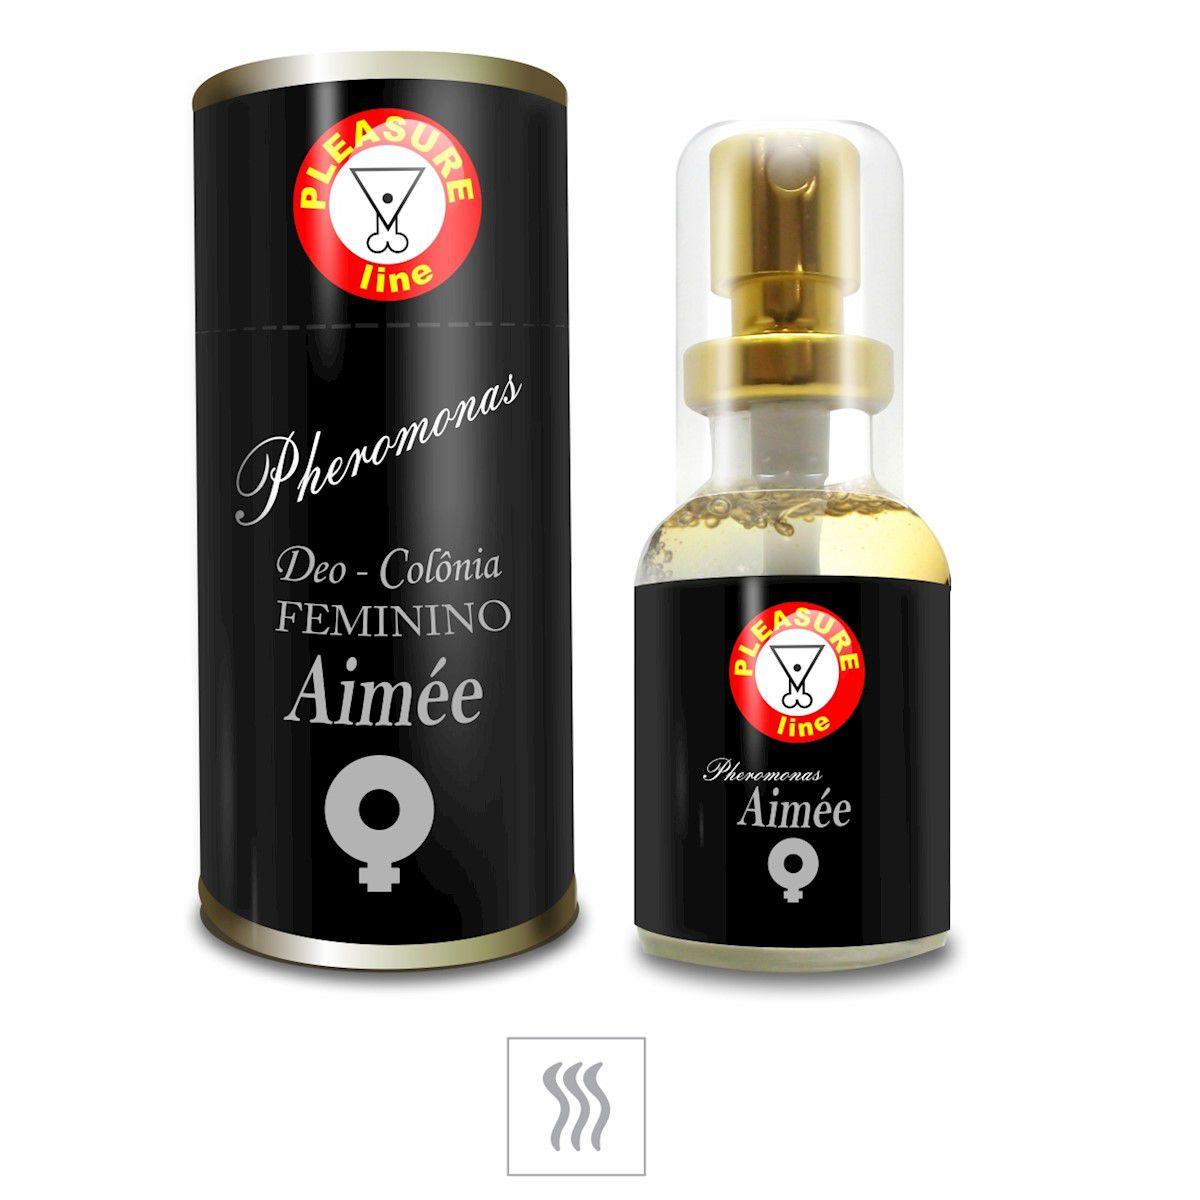 Kit 3 Perfumes Femininos Afrodisiacos Ast Aimee e Jade 20ml Pleasure Line